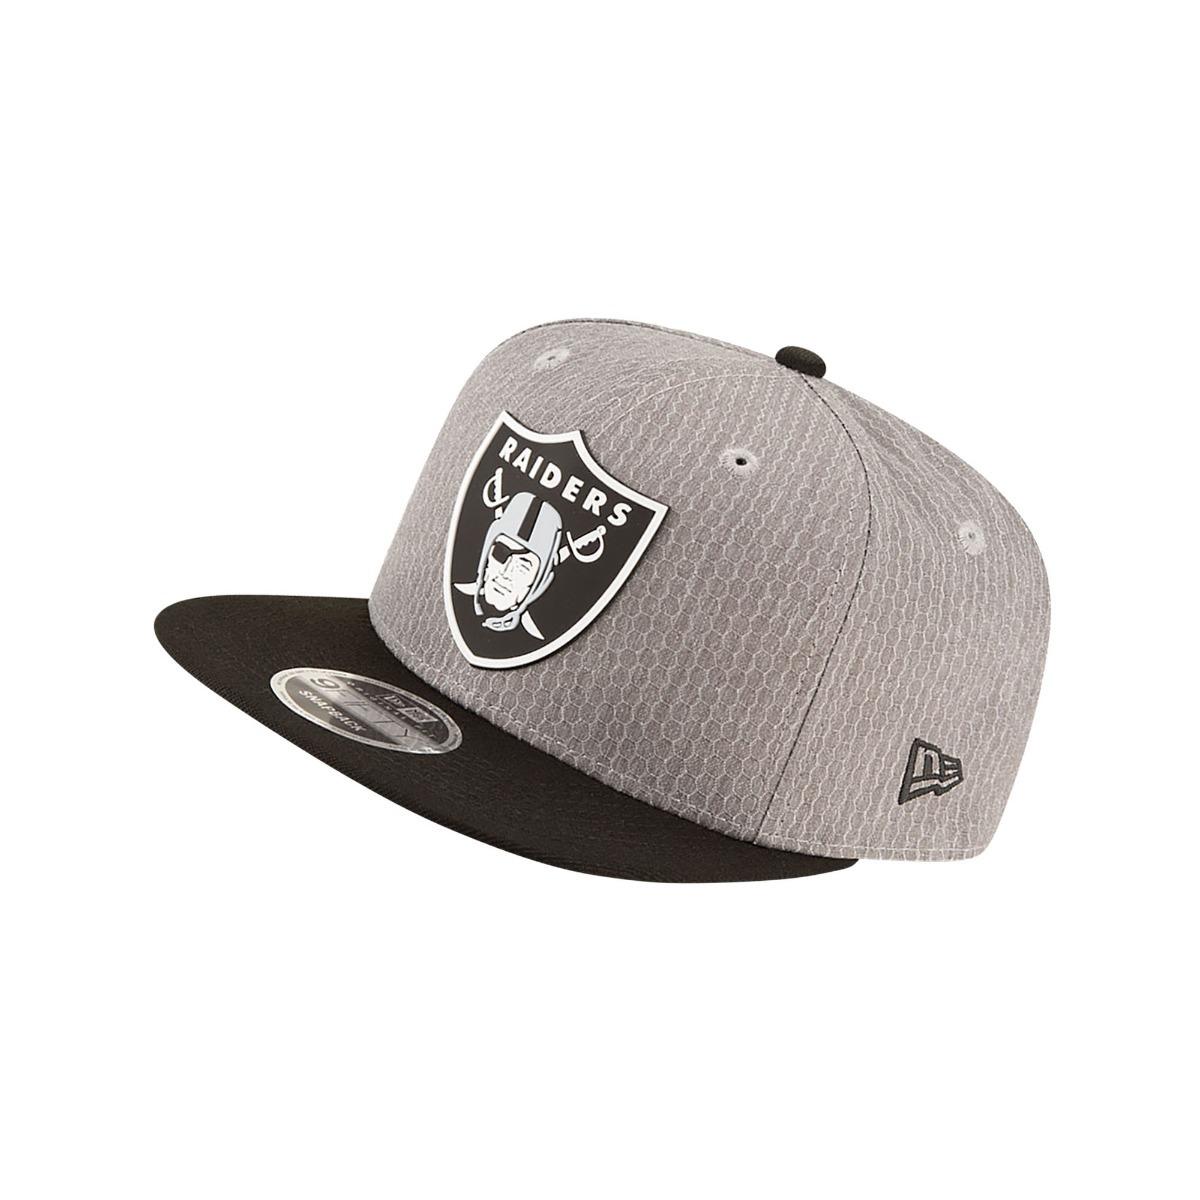 315748f2d36c5 Gorra New Era Nfl 9fifty Oakland Raiders México Game Team -   729.00 en  Mercado Libre